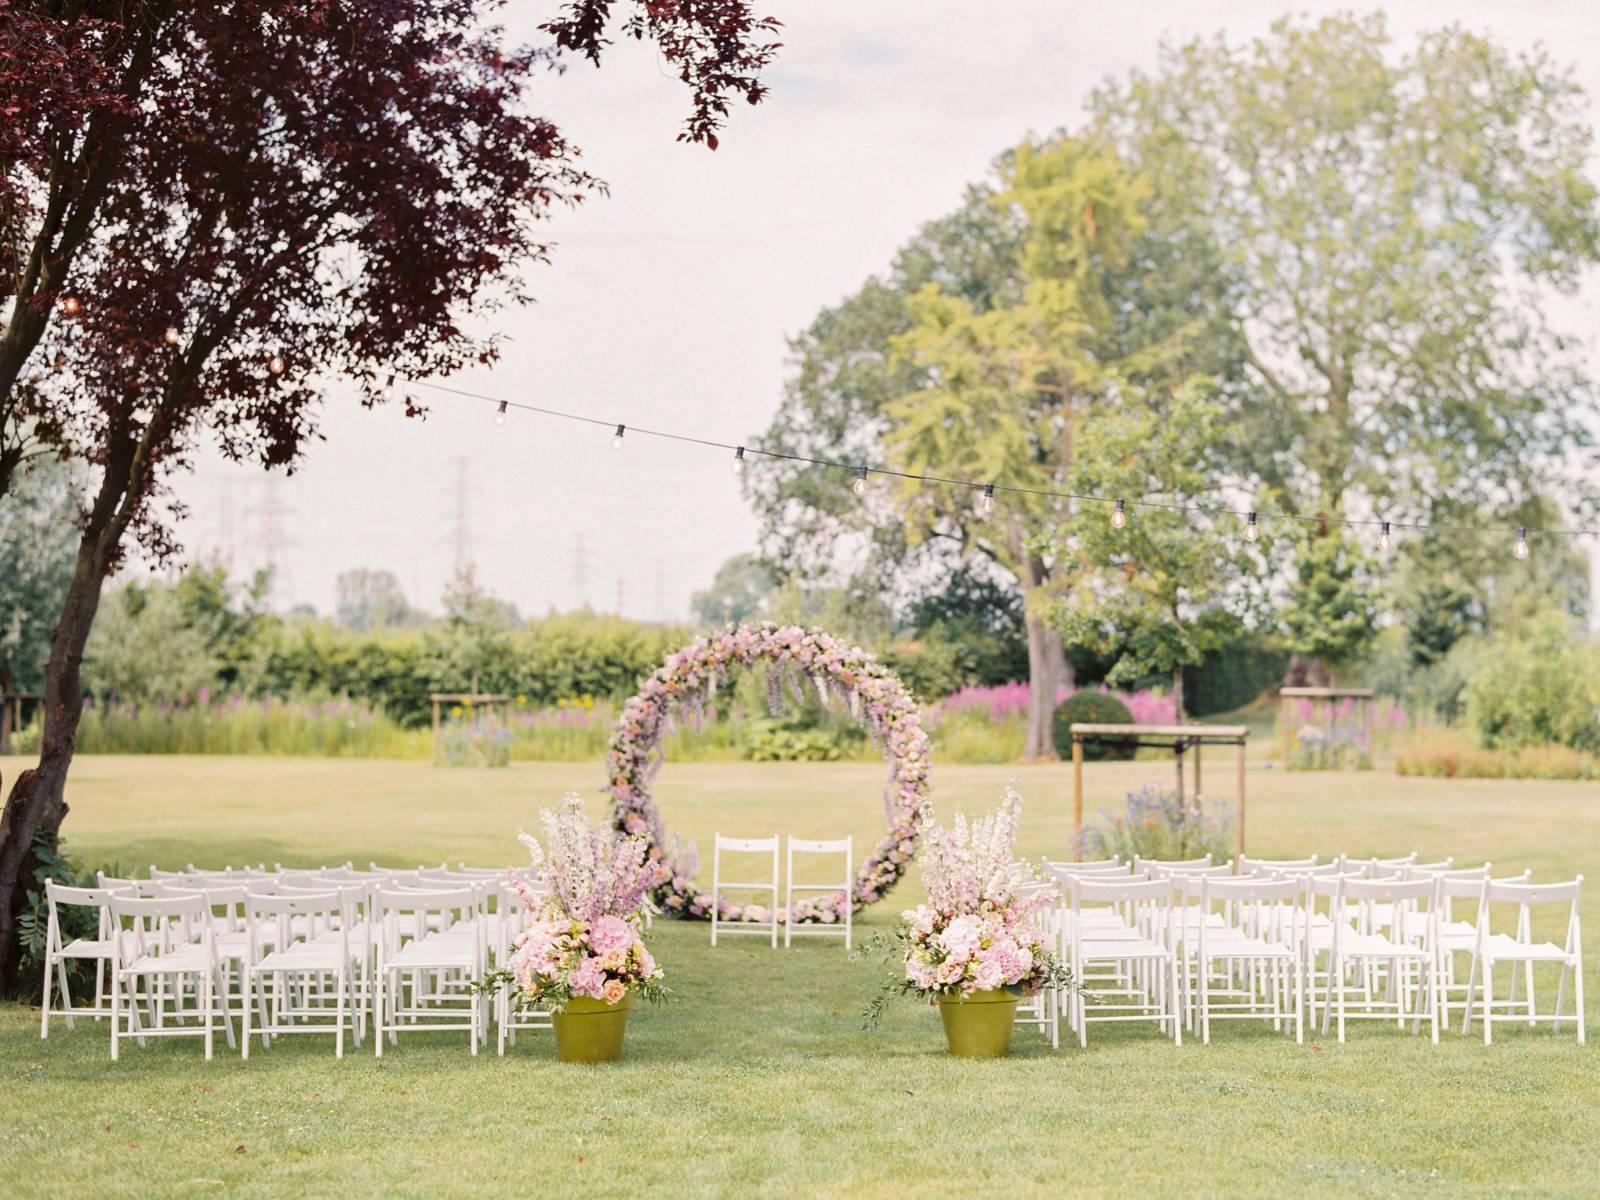 Maison Julie - Bruidsboeket - Bloemen huwelijk trouw bruiloft - Kelly & Jonas - Long Story Short - House of Weddings - 6